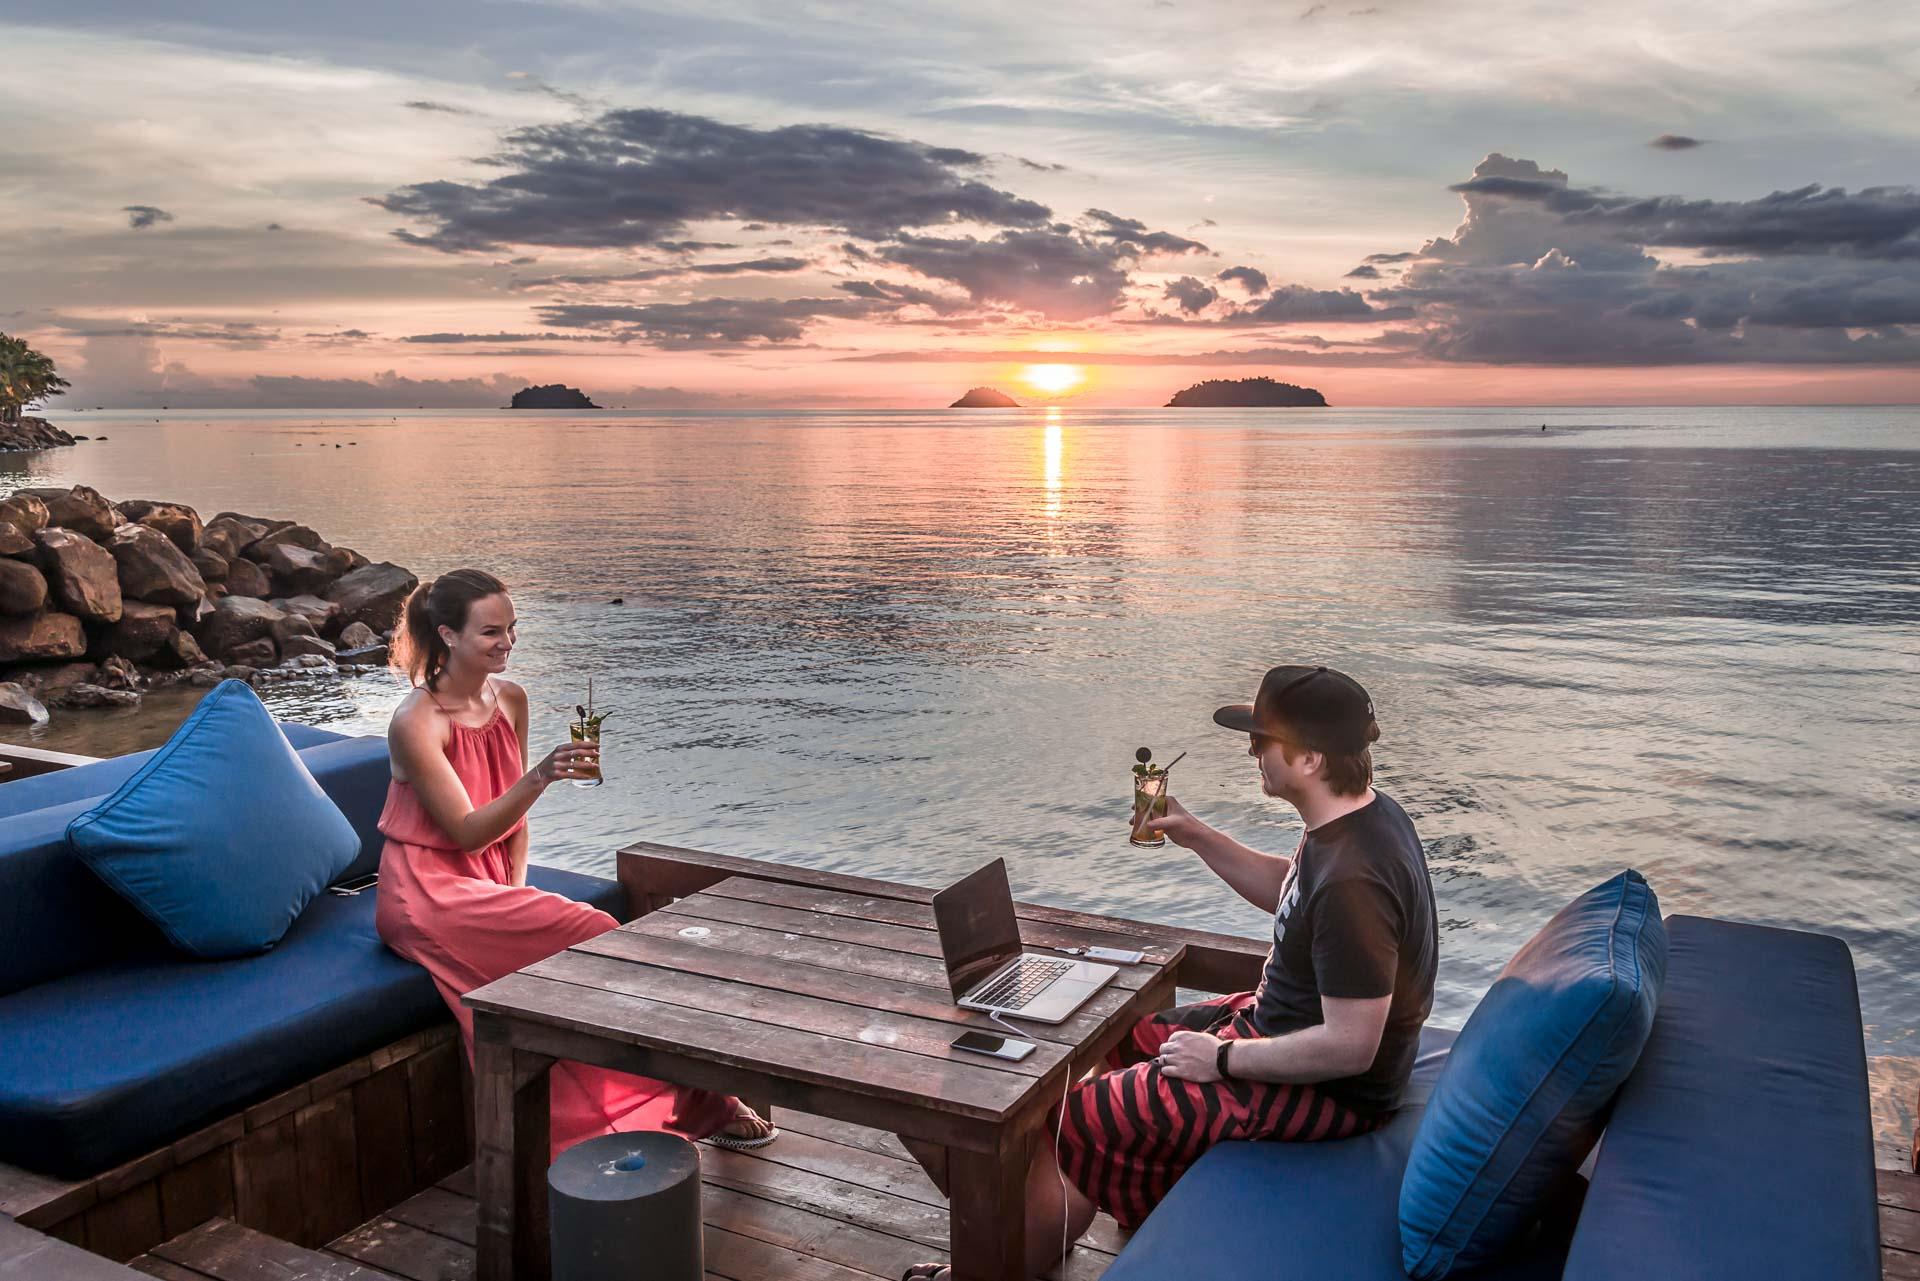 koh-chang-sonnenuntergang-awa-resort-adi-valeria